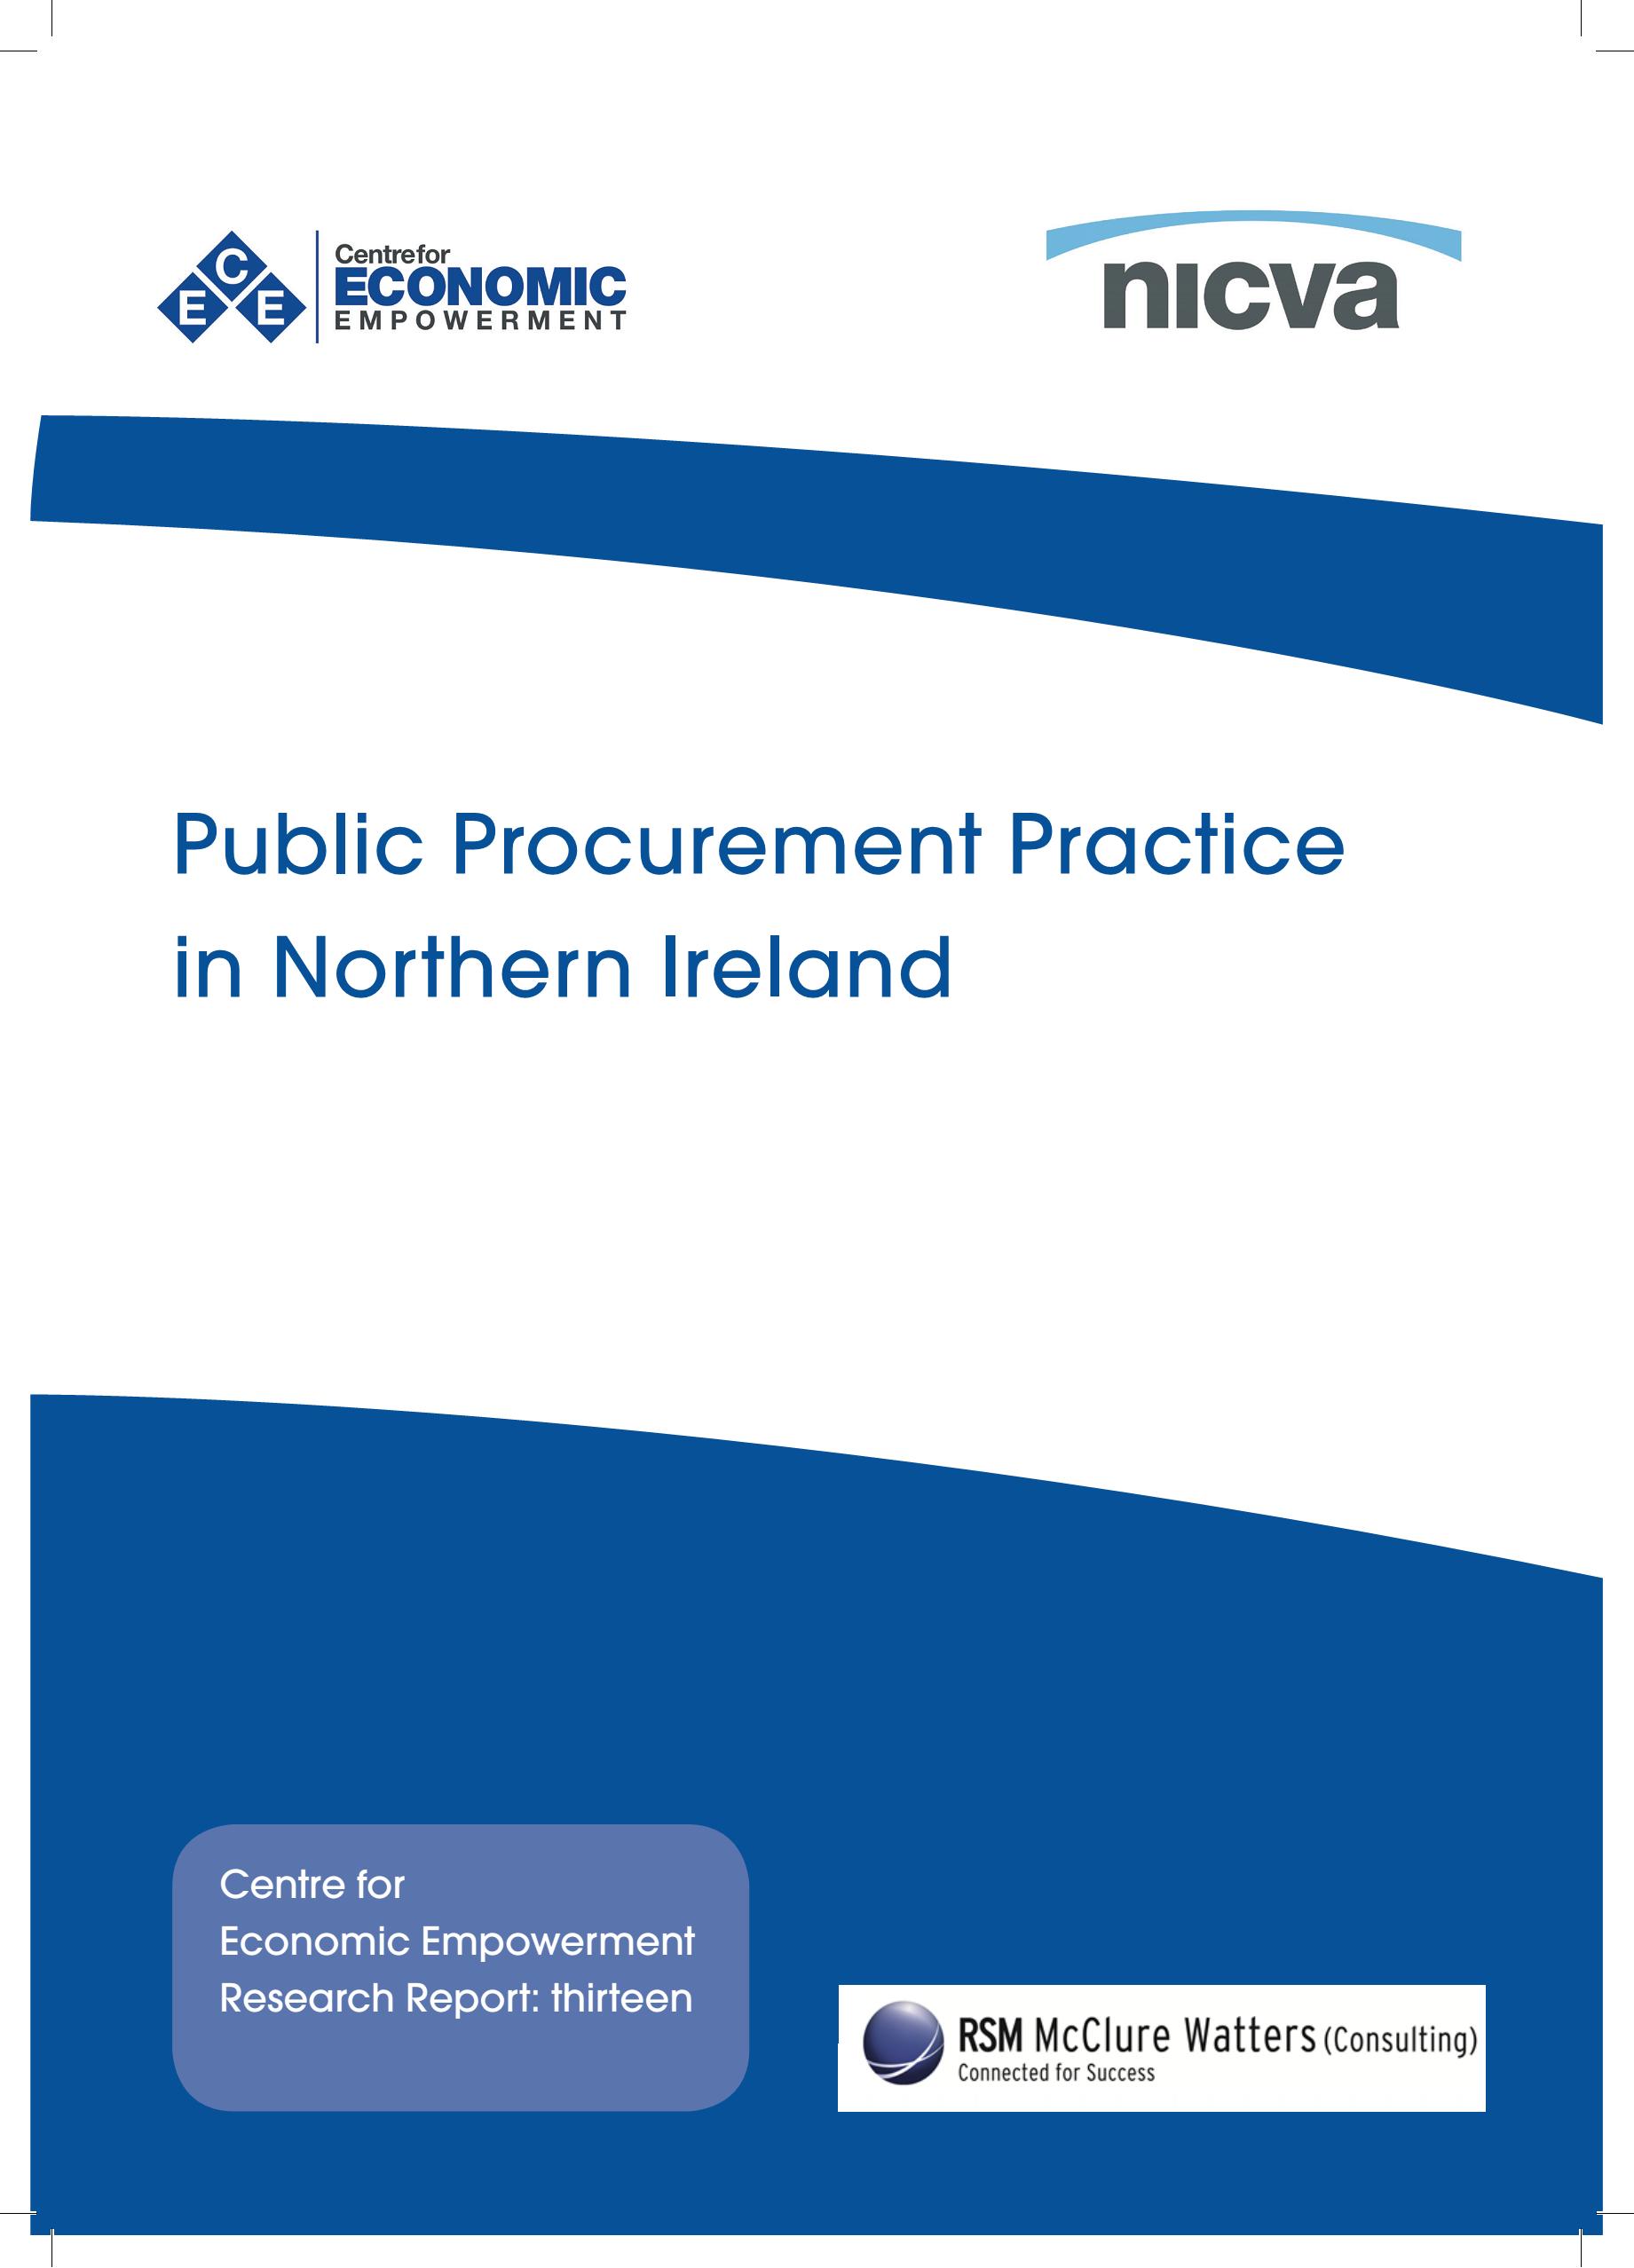 Public Procurement Practice in Northern Ireland   NICVA